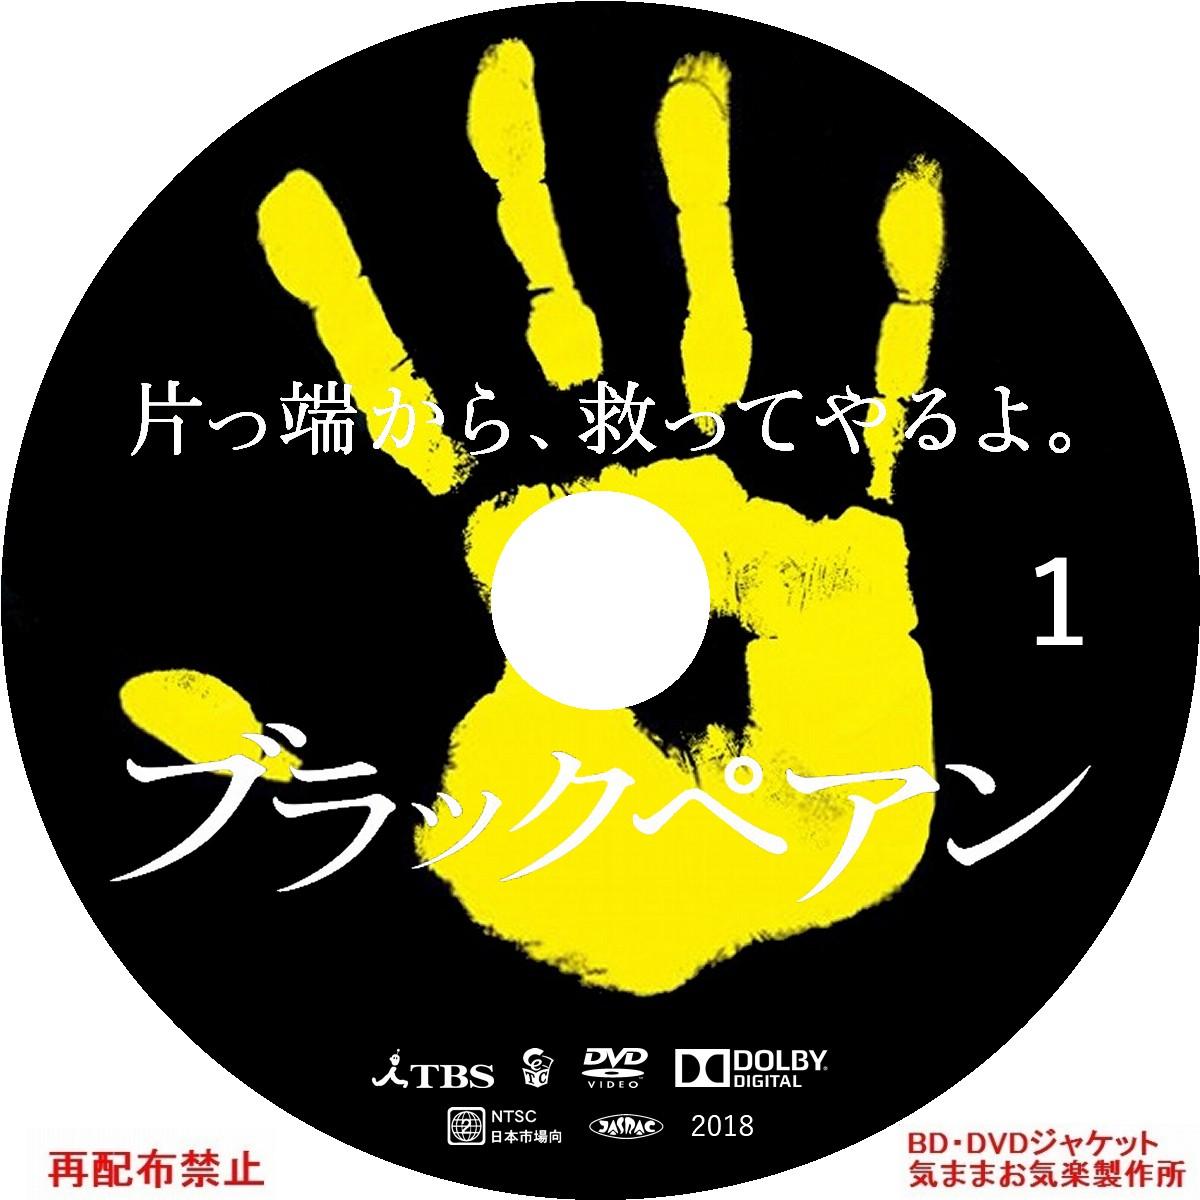 Black_pean_DVD01.jpg